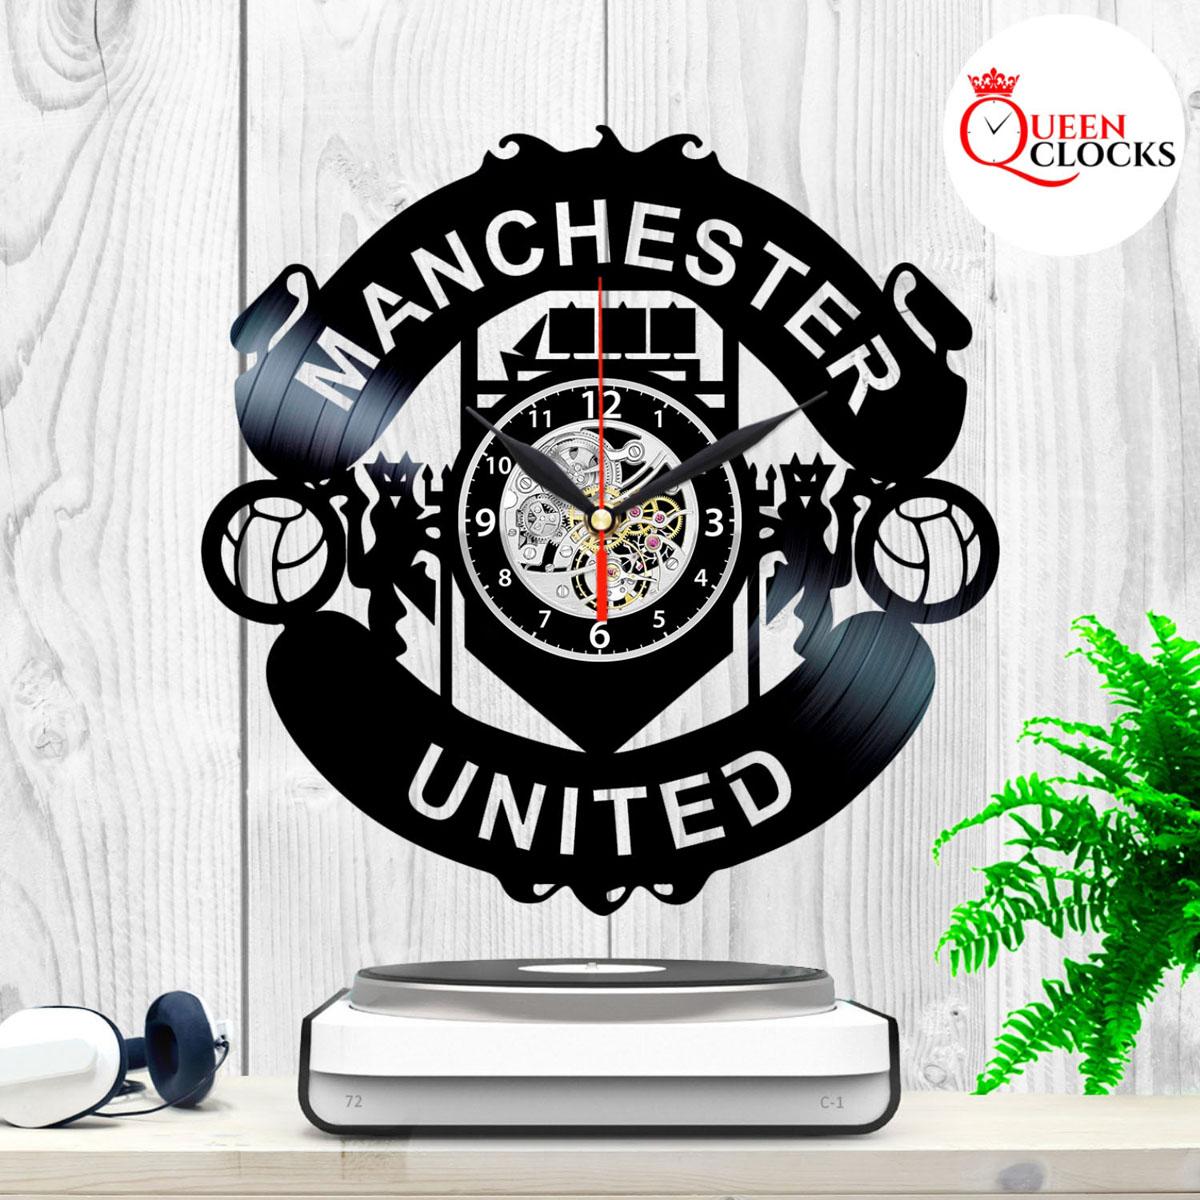 Details about Manchester United Logo Emblem Vinyl Record Wall Clock Best  Fans Gift Home Decor.